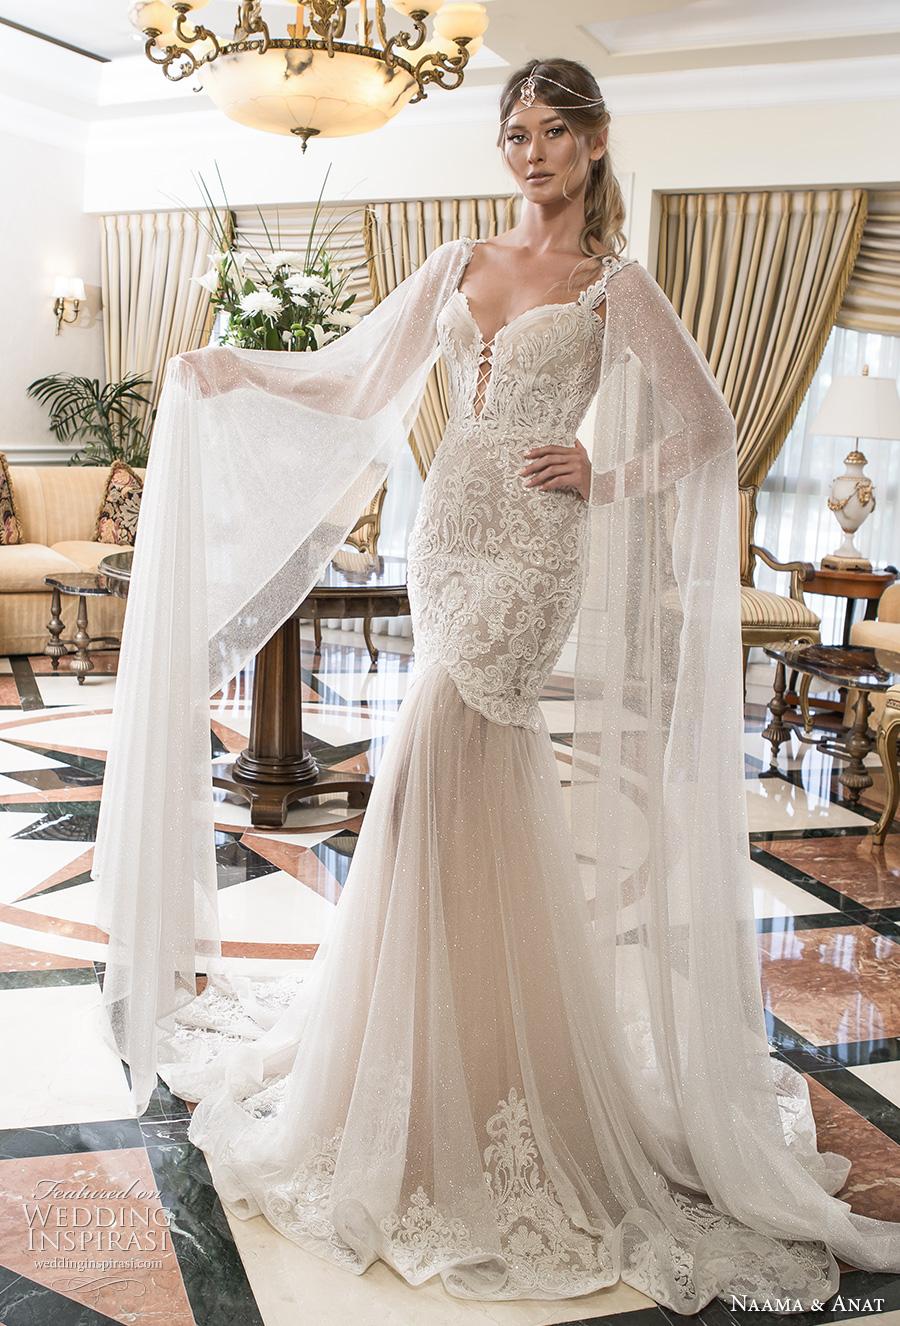 naama and anat 2018 bridal lace strap deep plunging sweetheart neckline heavily embellished bodice tulle skirt glamorous elegant trumpet wedding dress short train (soul) mv